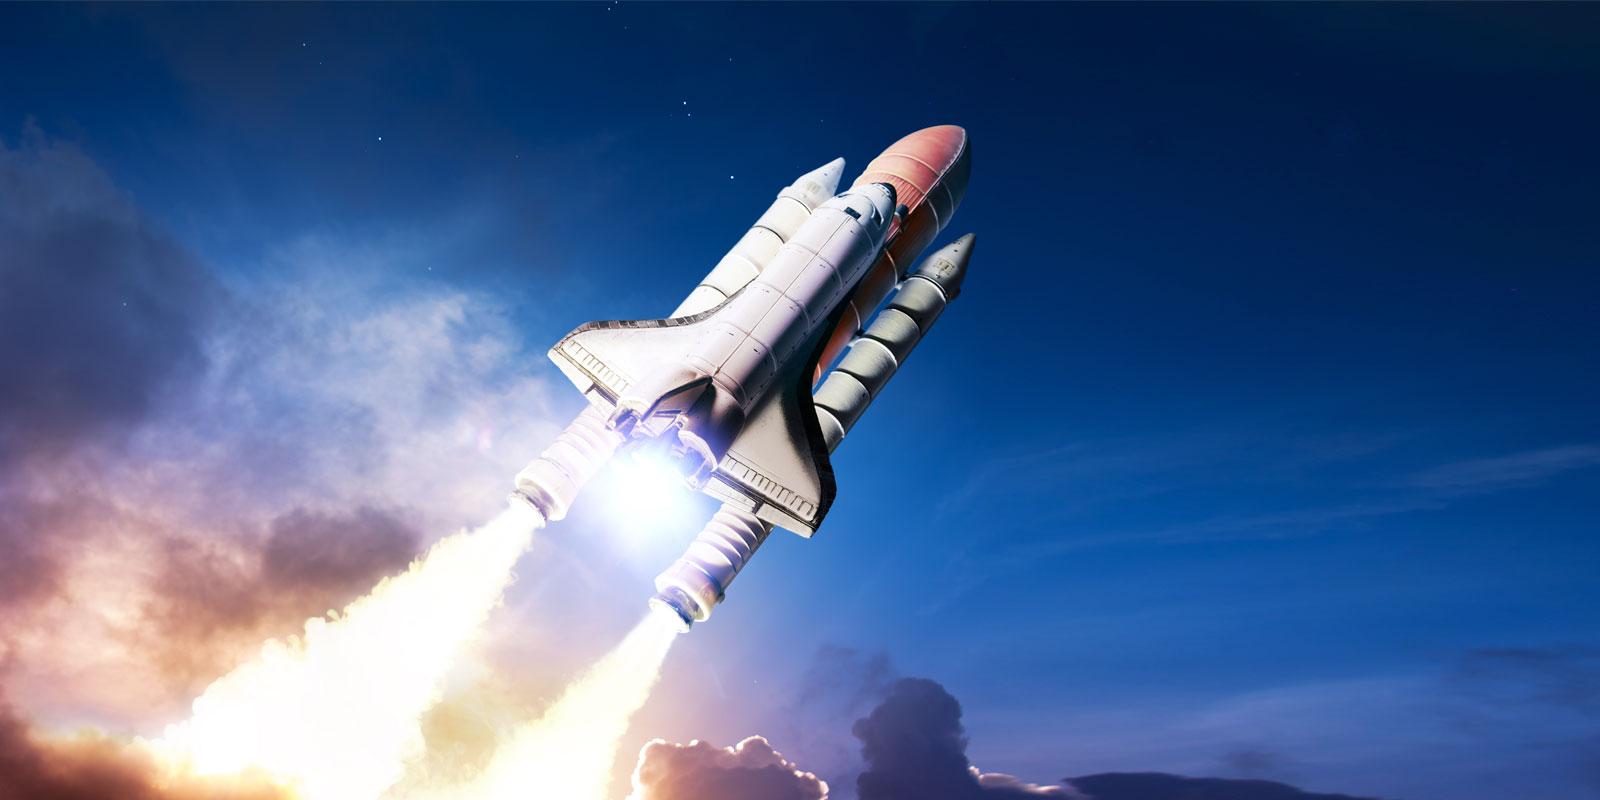 Big Rocket Has Launched